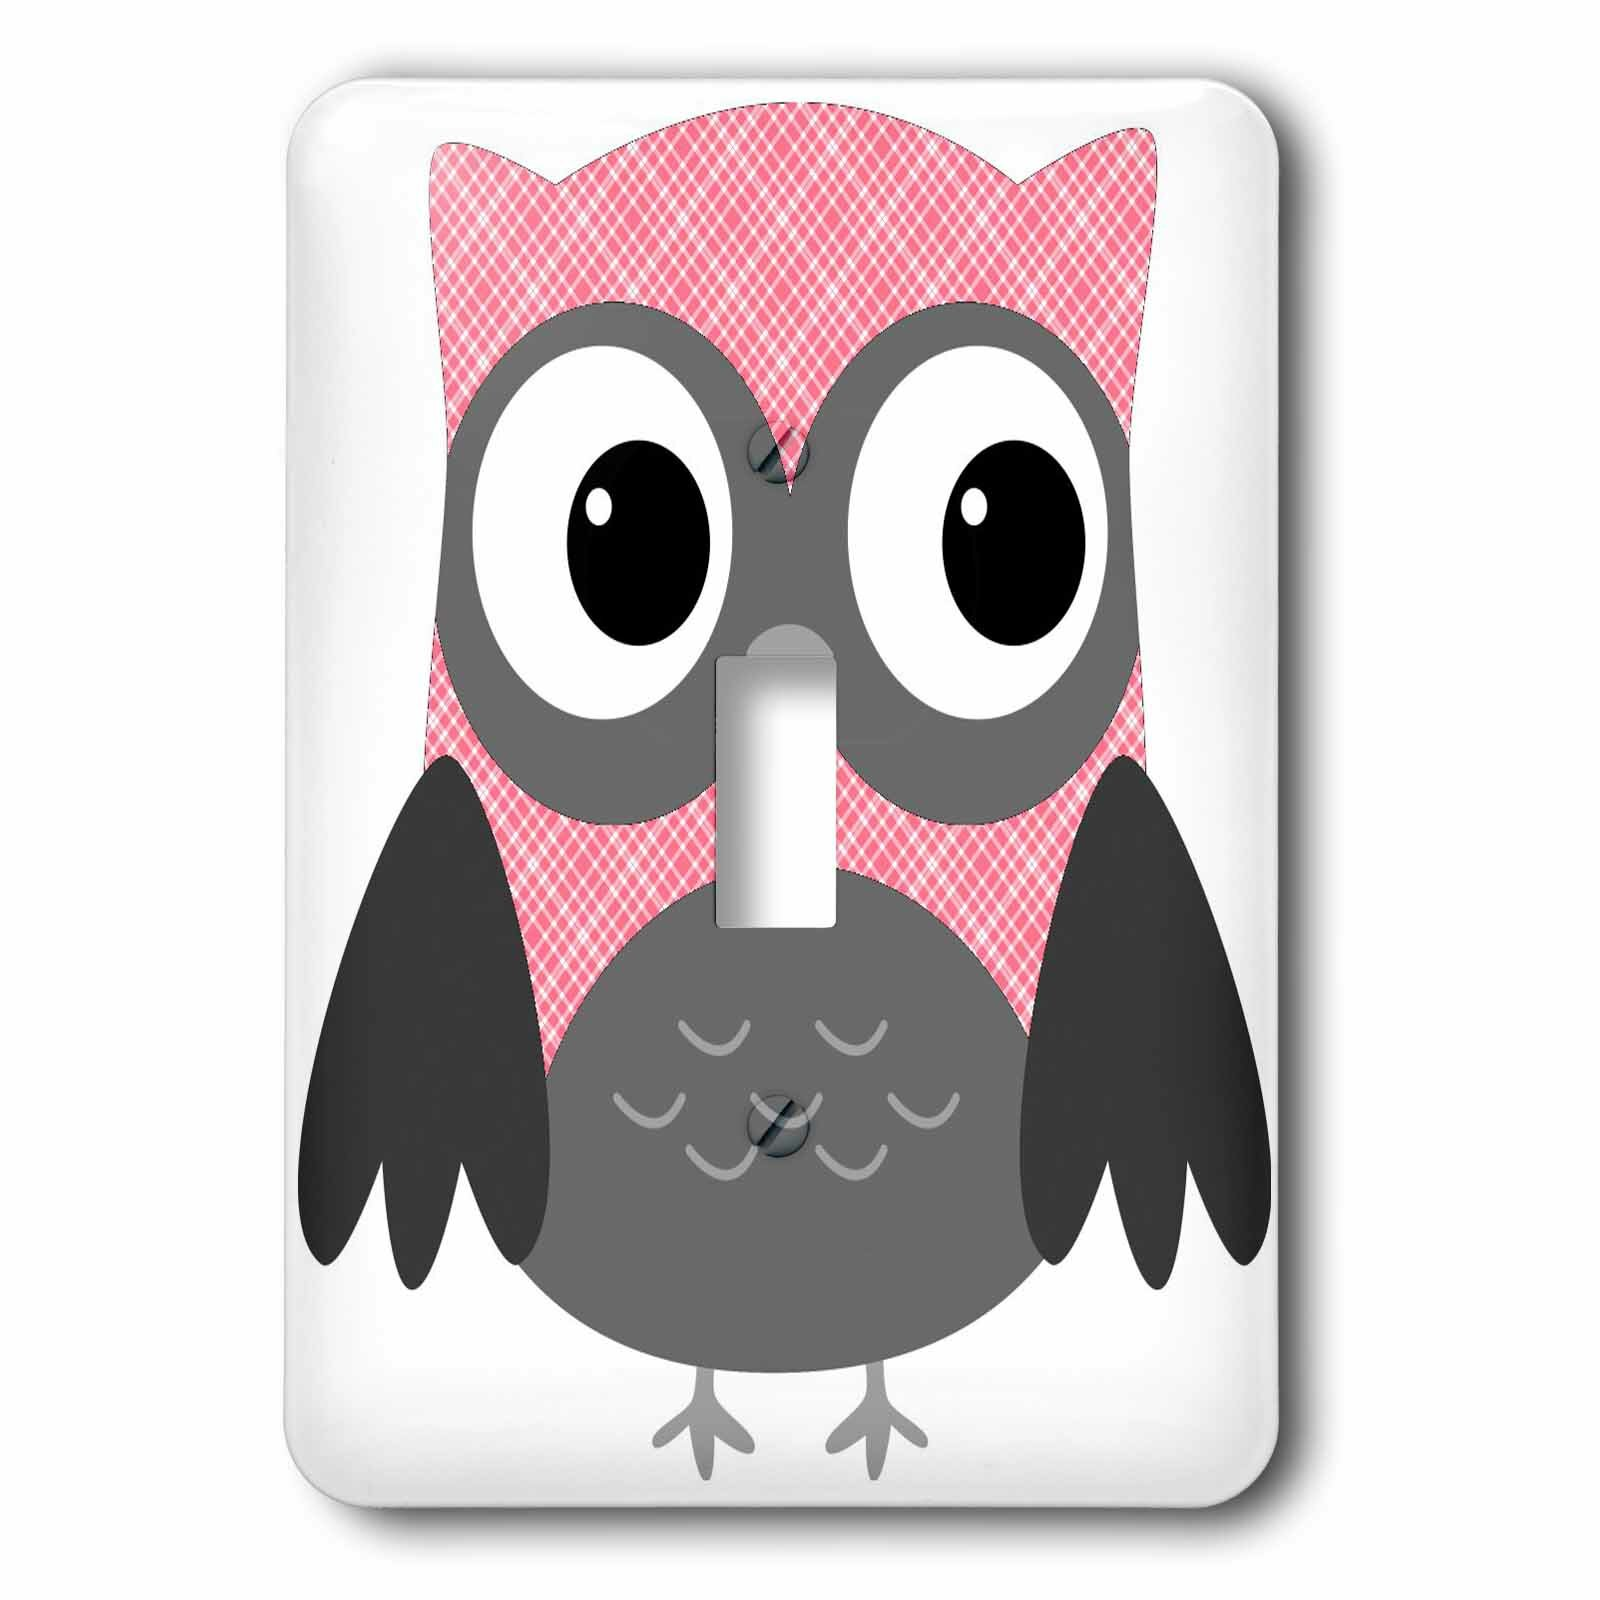 3drose Cute Plaid Owl 1 Gang Toggle Light Switch Wall Plate Wayfair